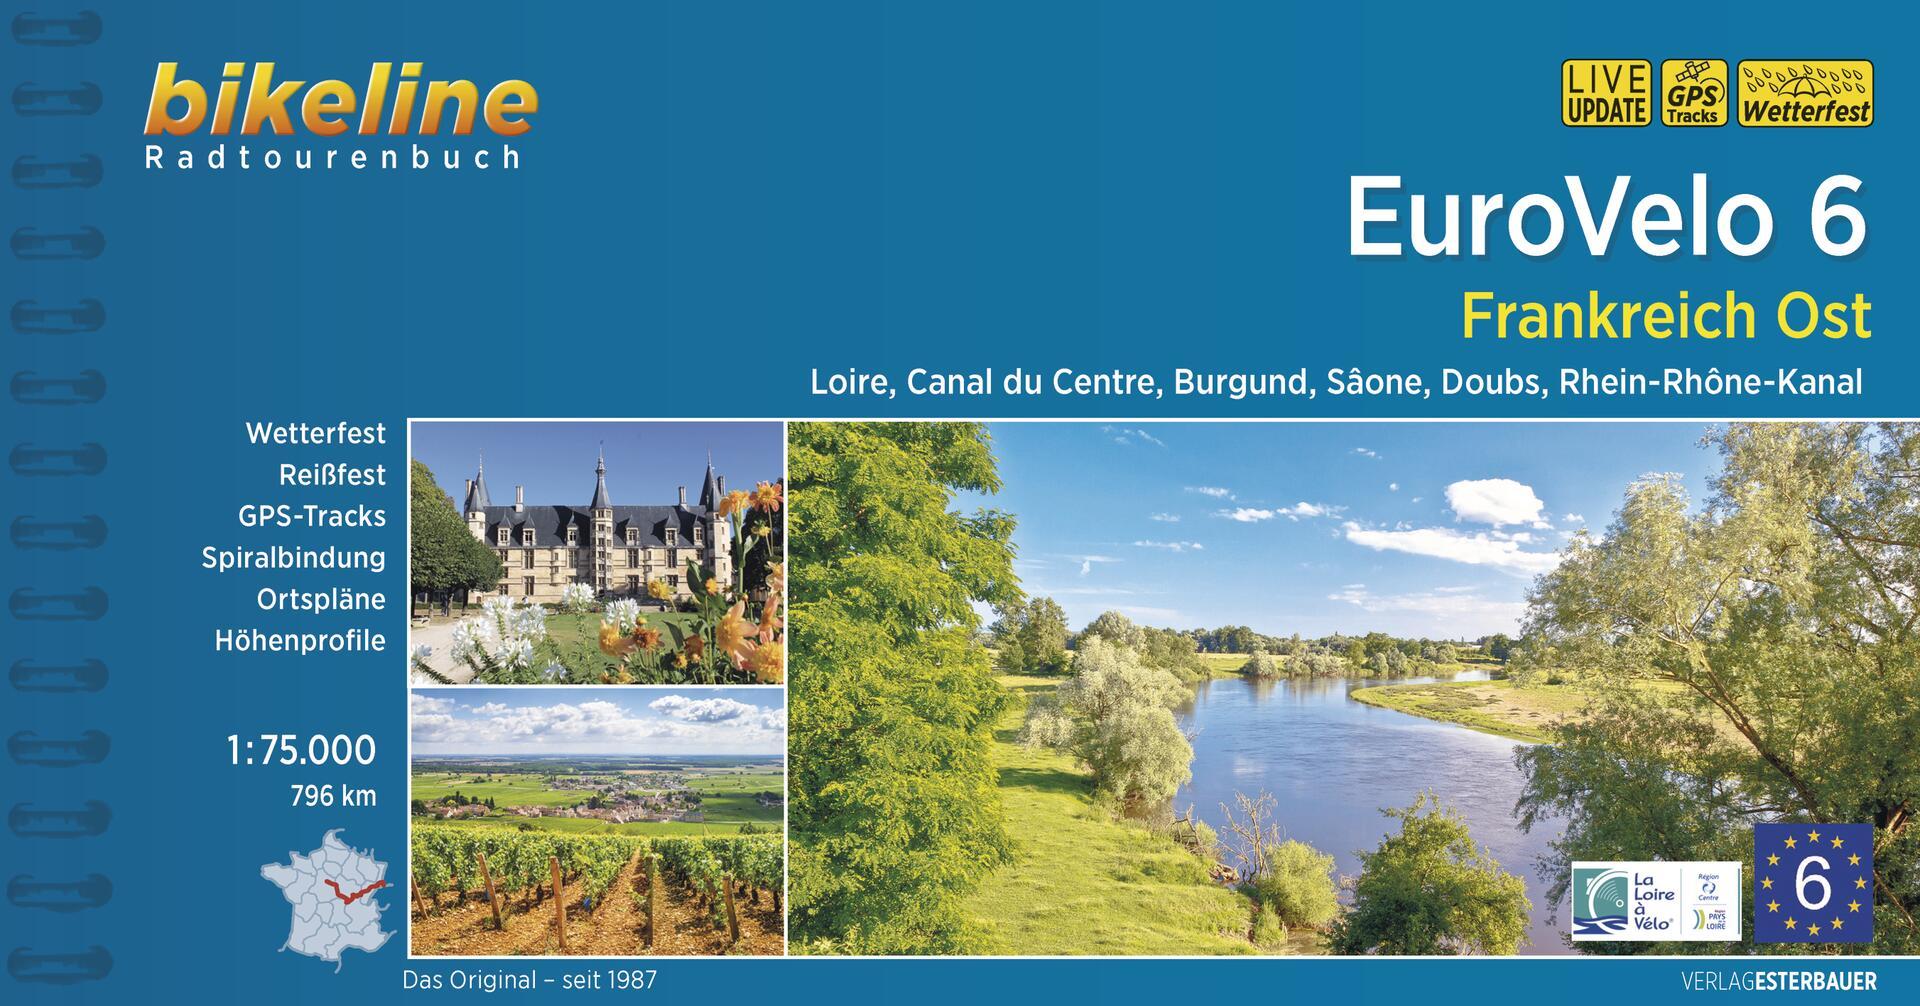 Foto vom Eurovelo 6 • Frankreich Ost